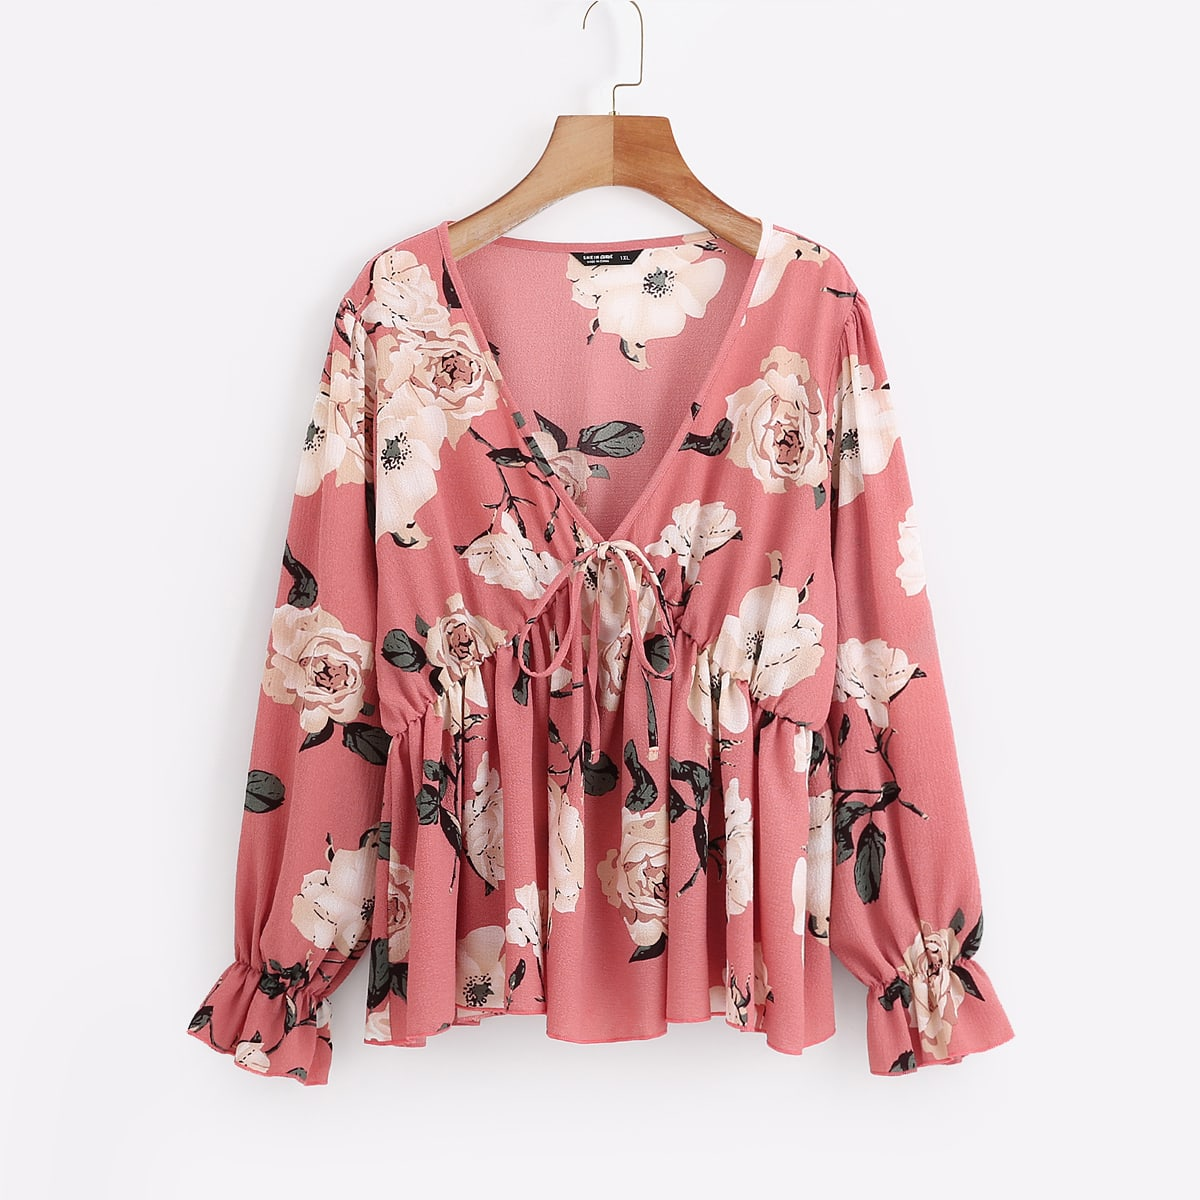 SHEIN Schattig Bloemen Grote maat blouse Geribd